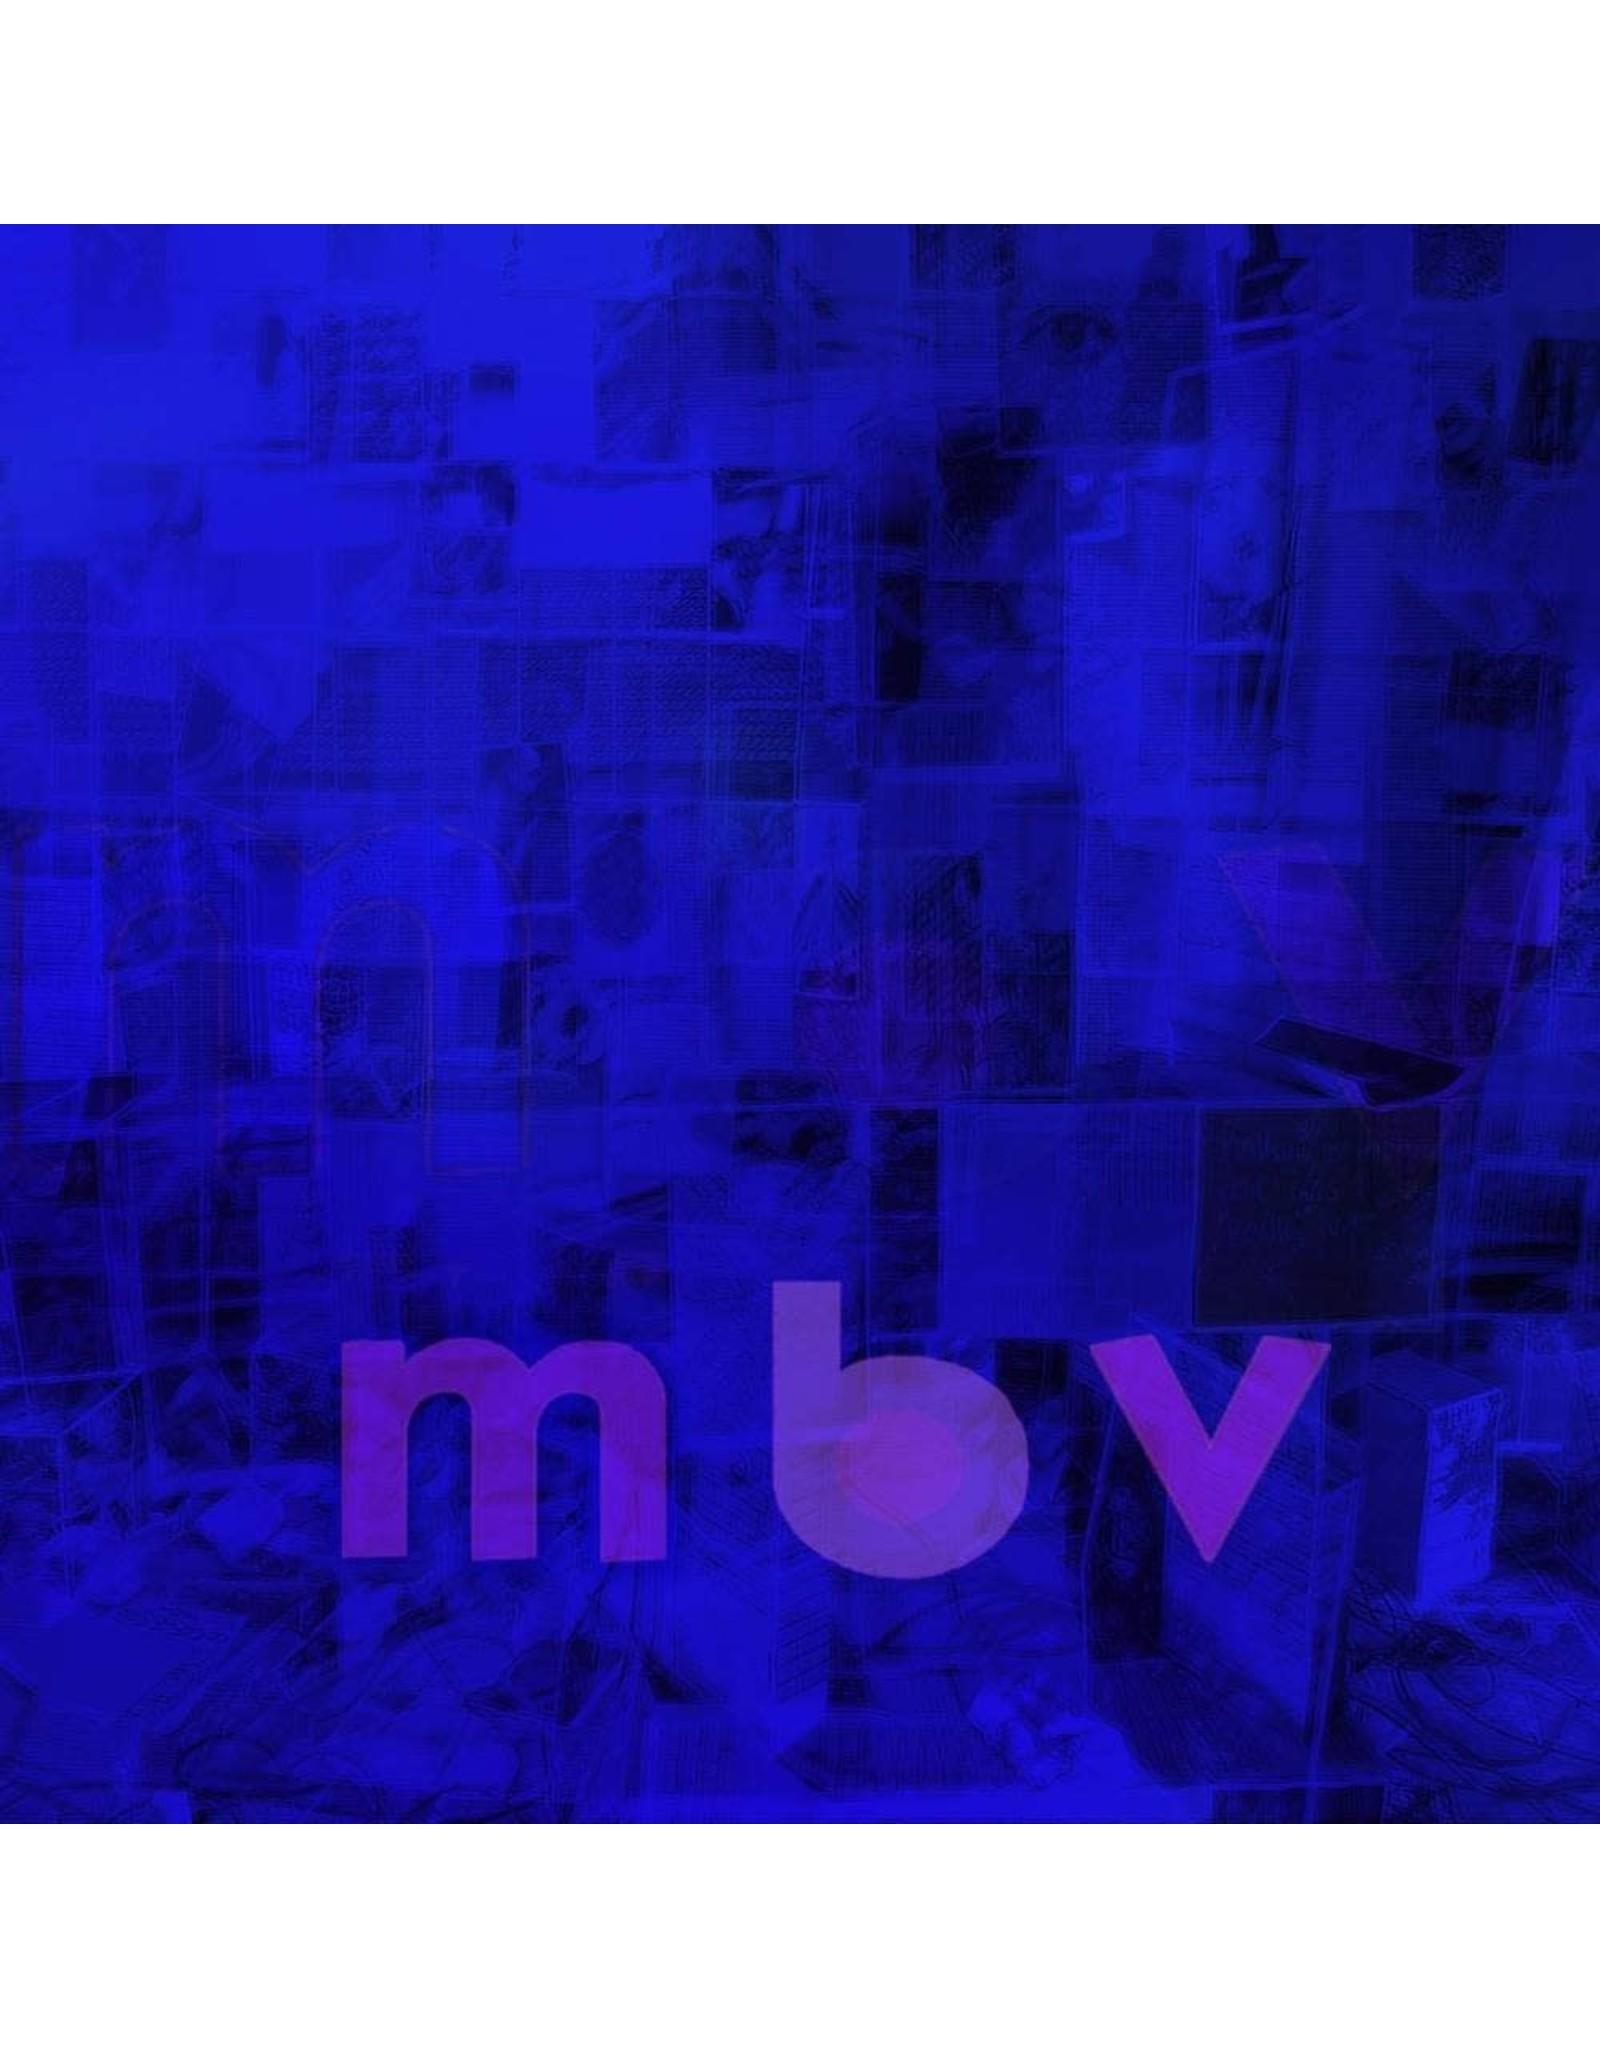 My Bloody Valentine - mbv LP (Deluxe)